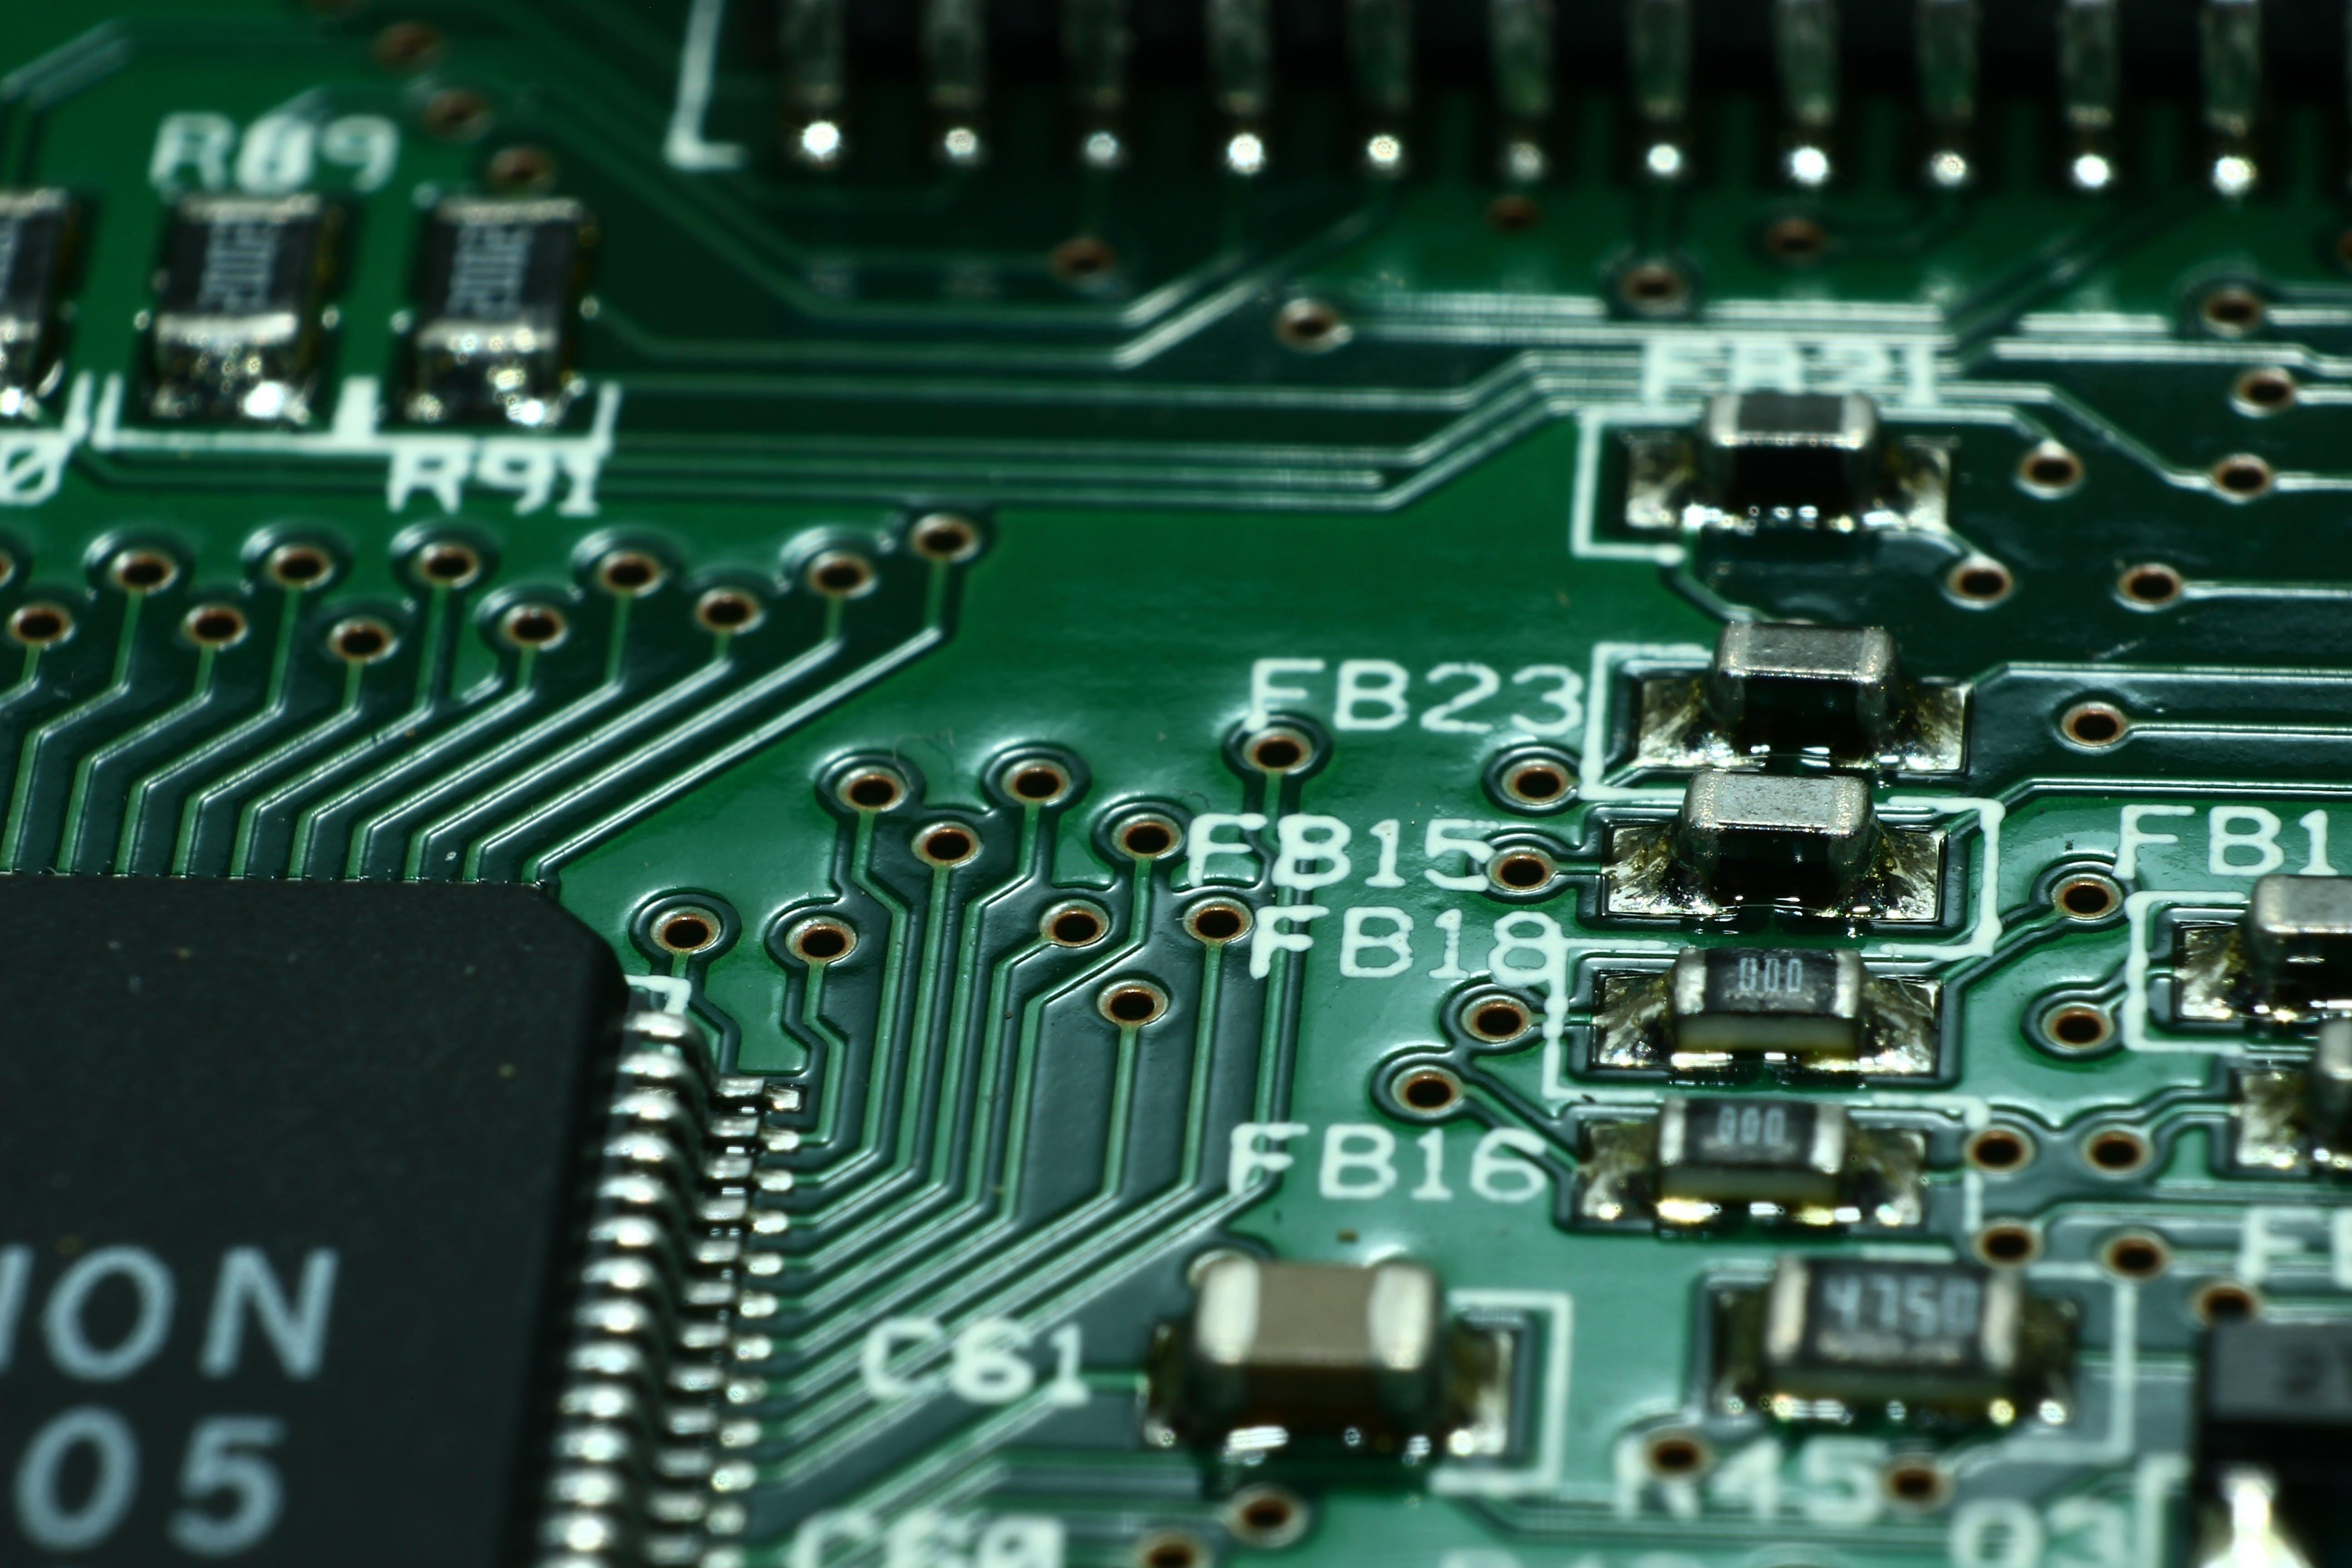 CPU, pcb, エレクトロニクス, エレメントの無料の写真素材